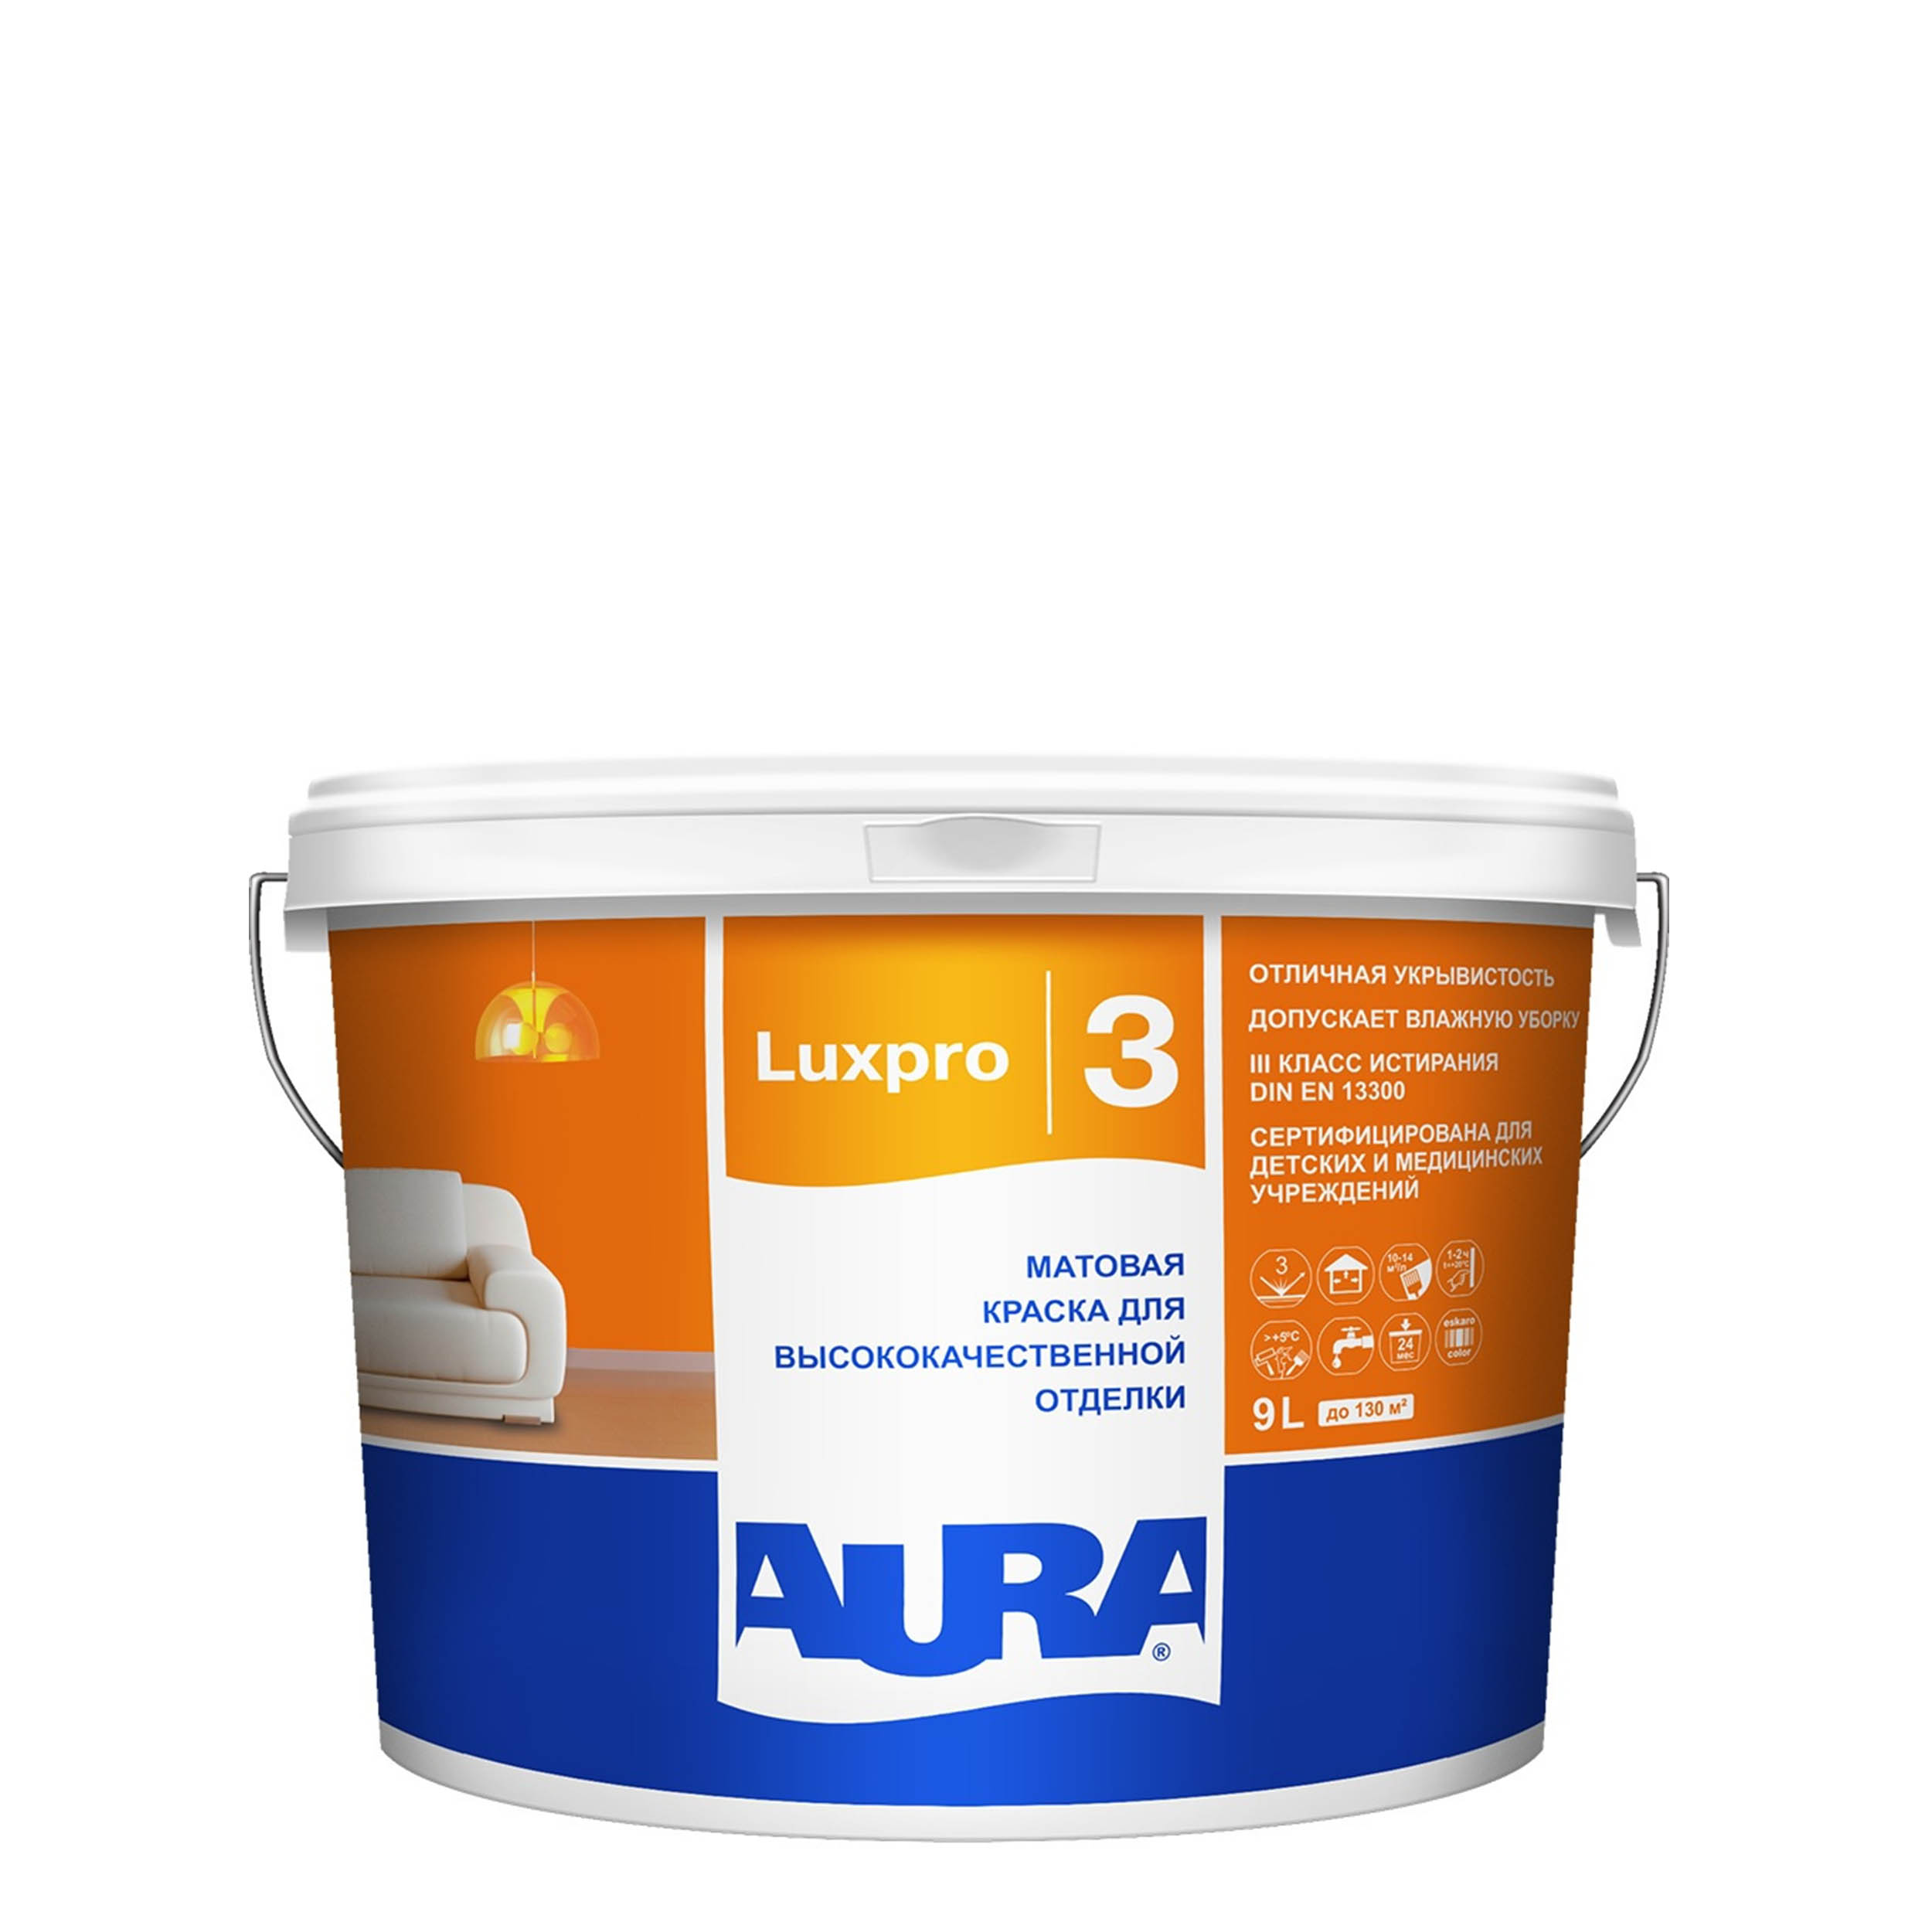 Фото 4 - Краска интерьерная, Aura LuxPRO 3, RAL 7013, 11 кг.